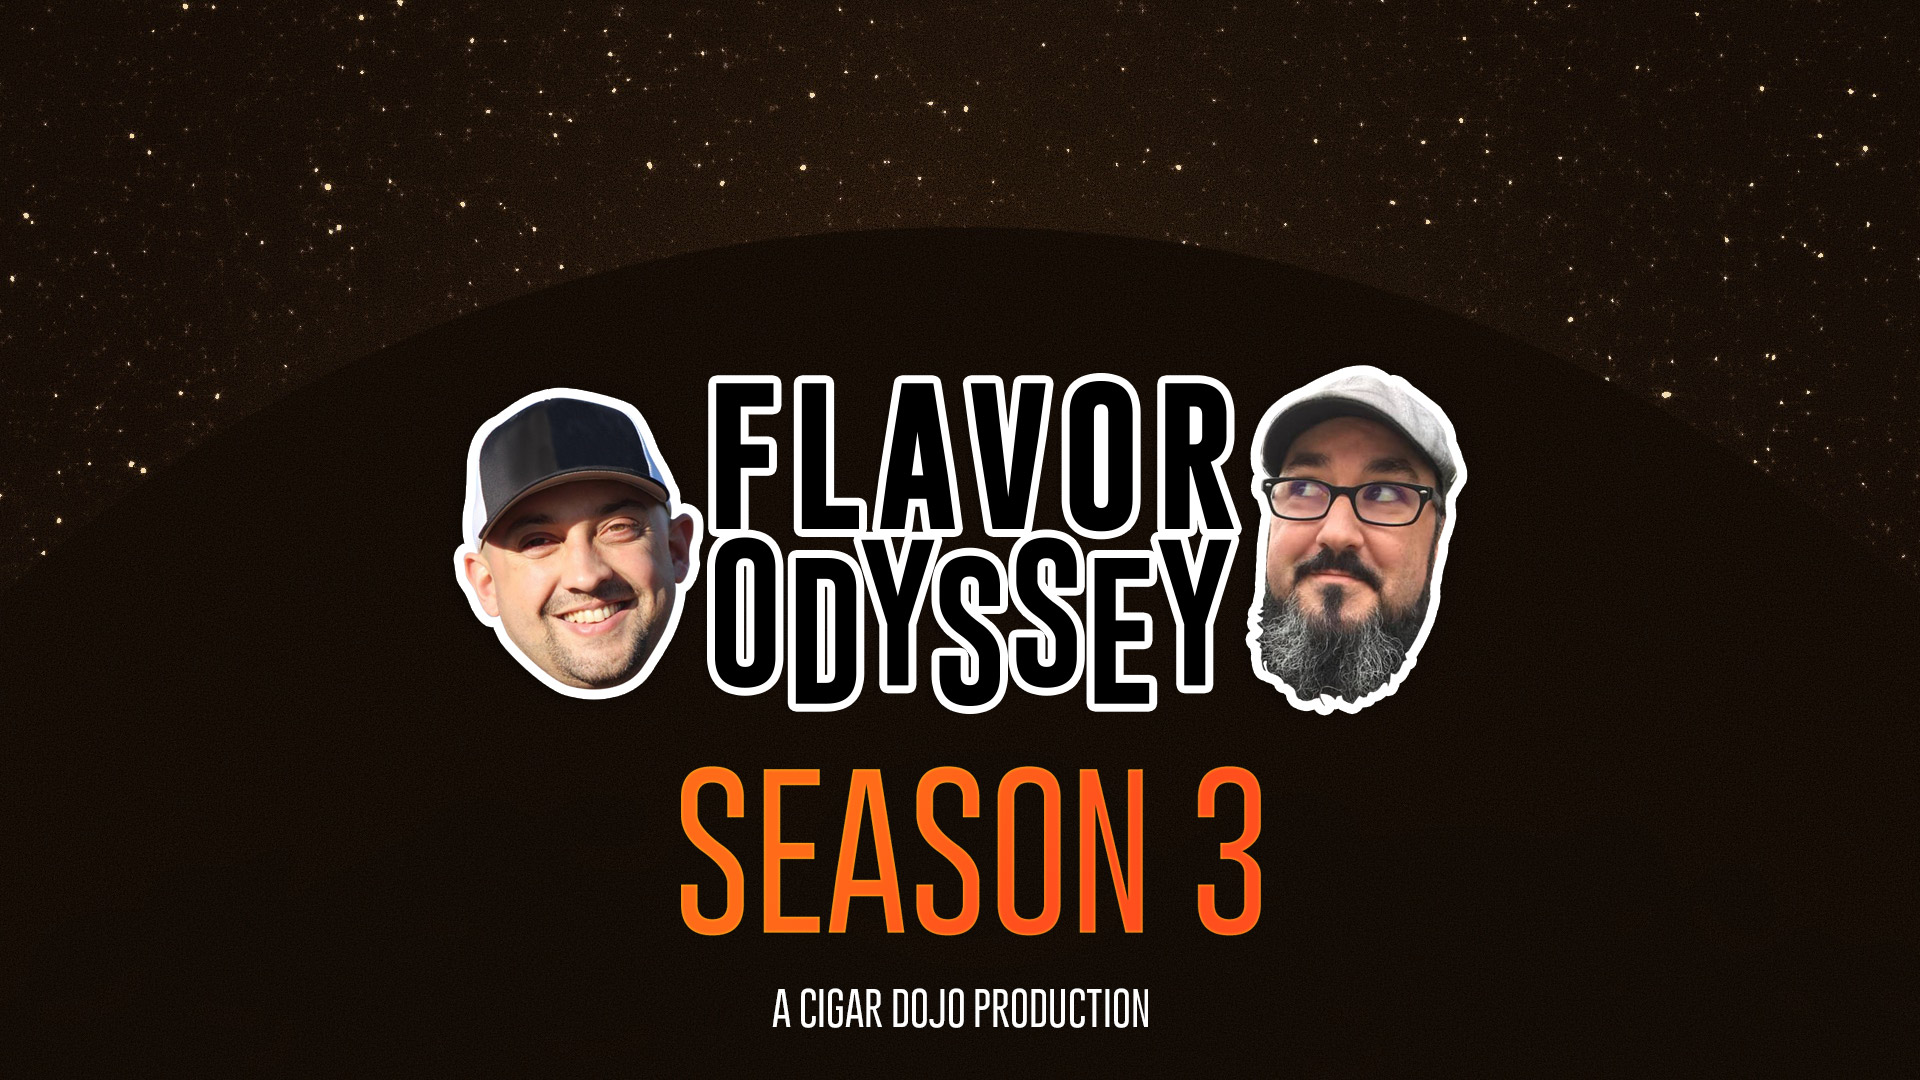 Flavor Odyssey Season 3 graphic